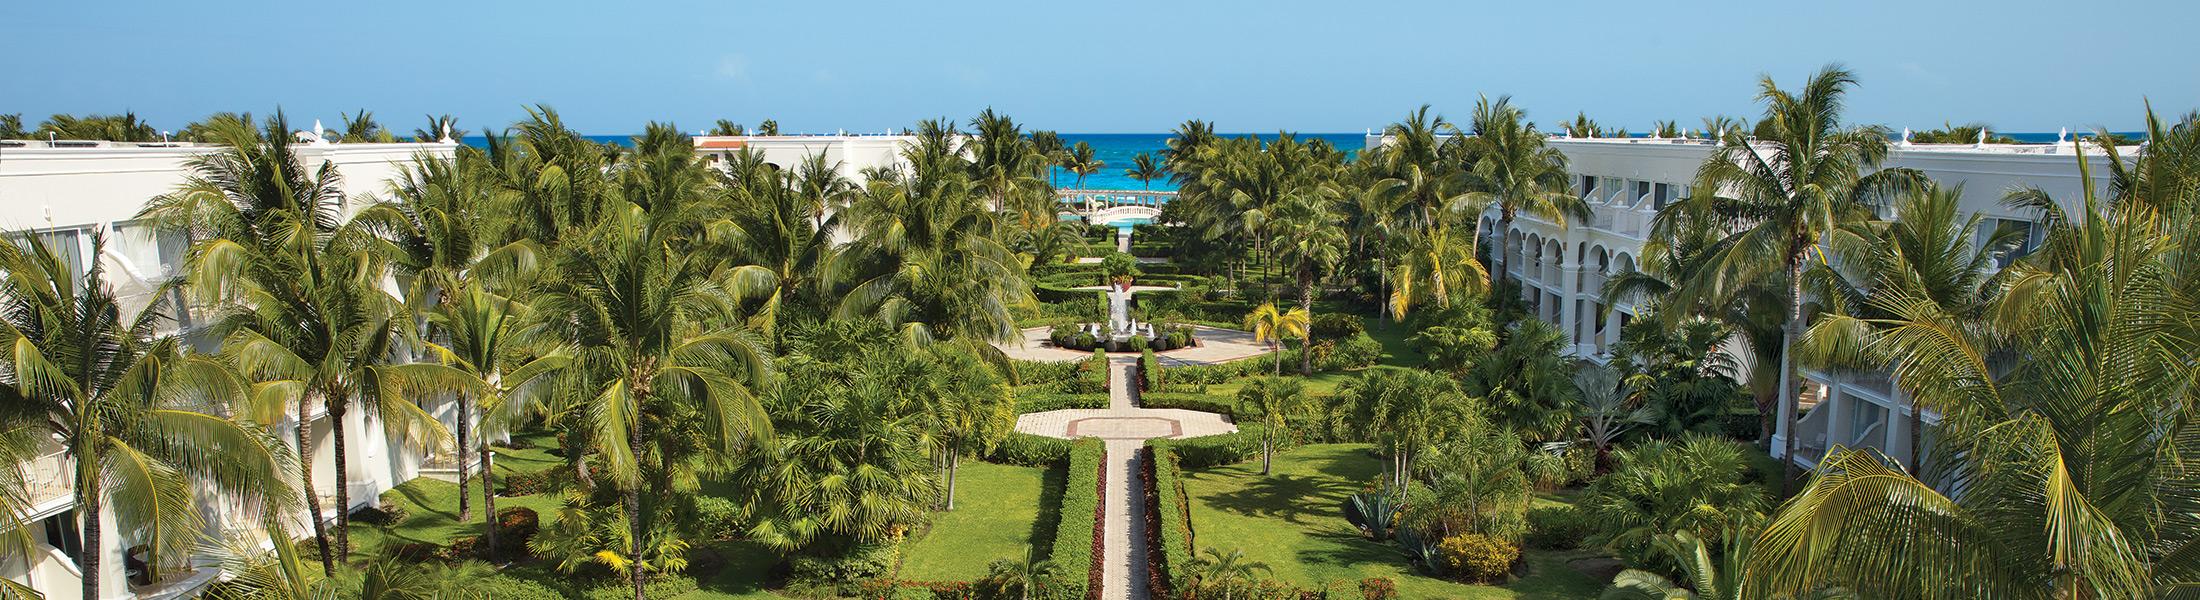 Aerial view of the resort gardens at Dreams Tulum Resort & Spa